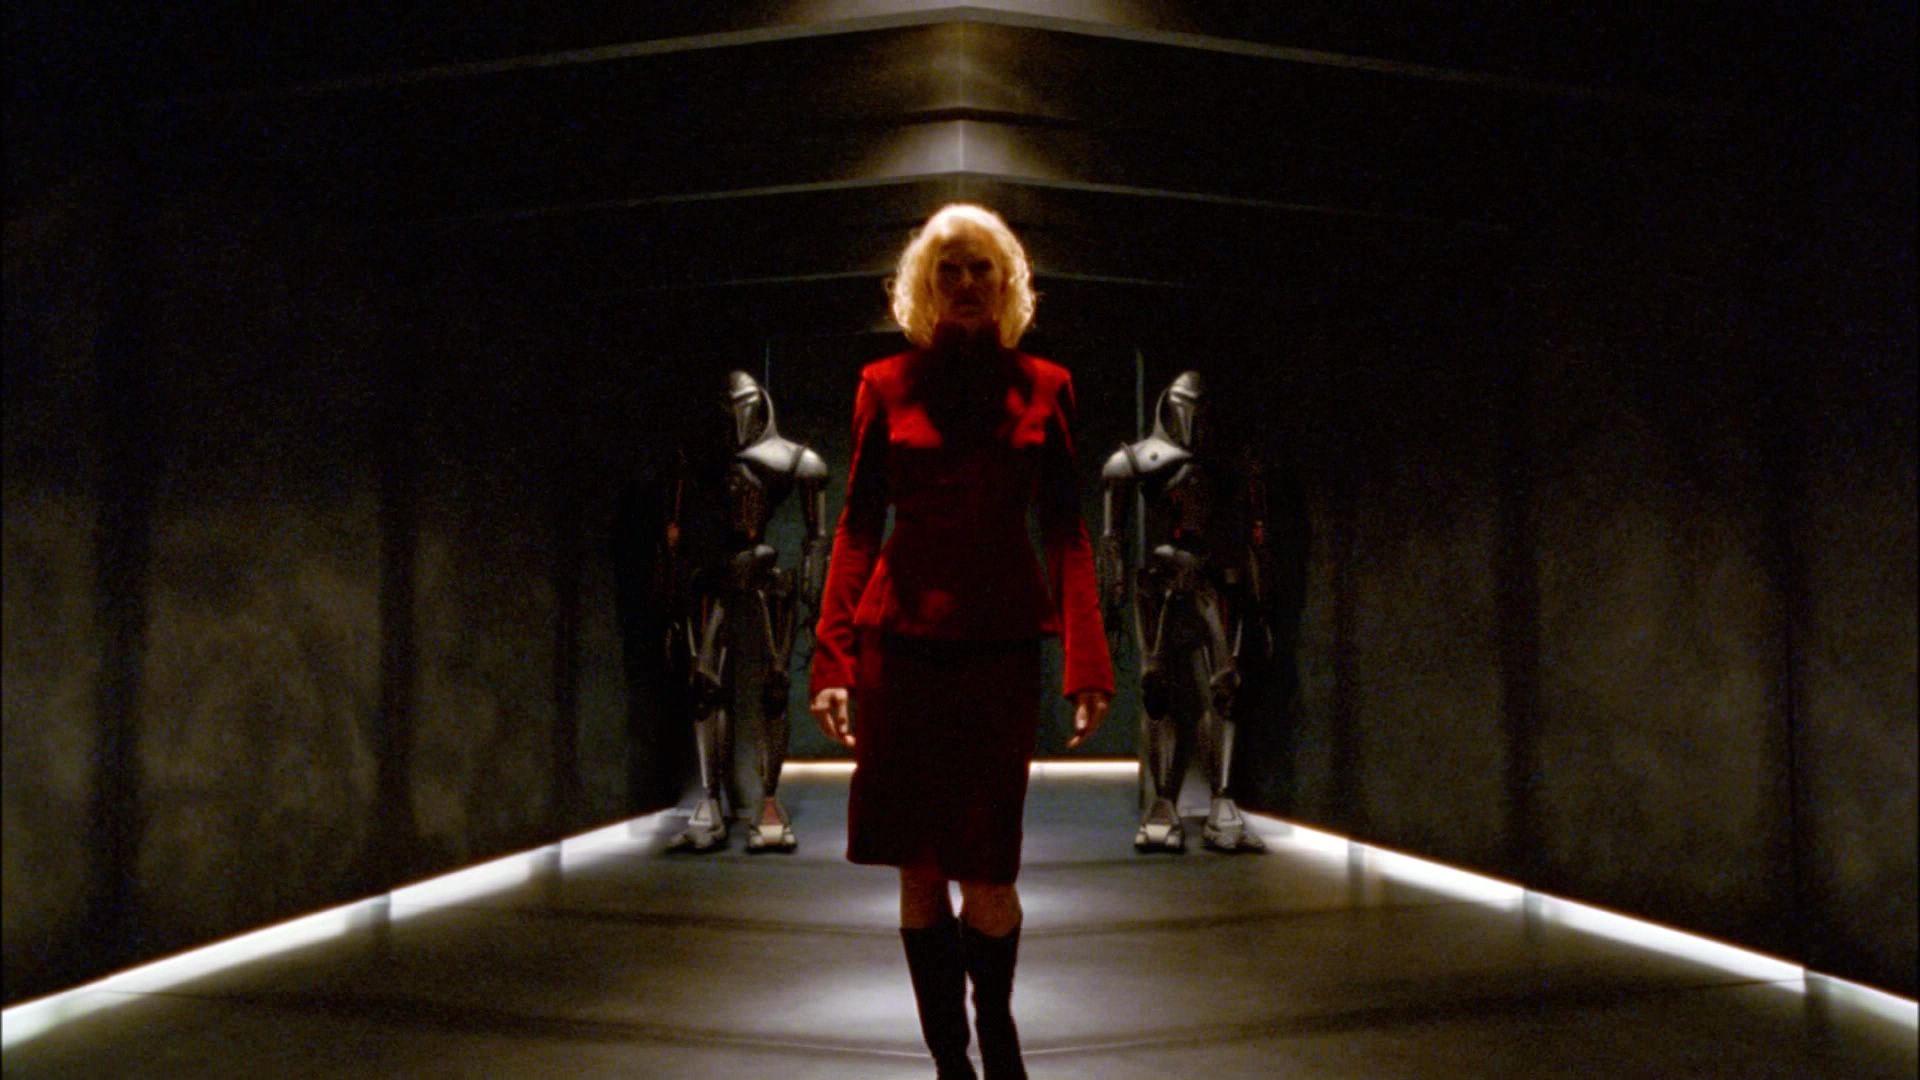 Battlestar Galactica - Page 9 Ariane179254_bsg_miniseries_part1_0147